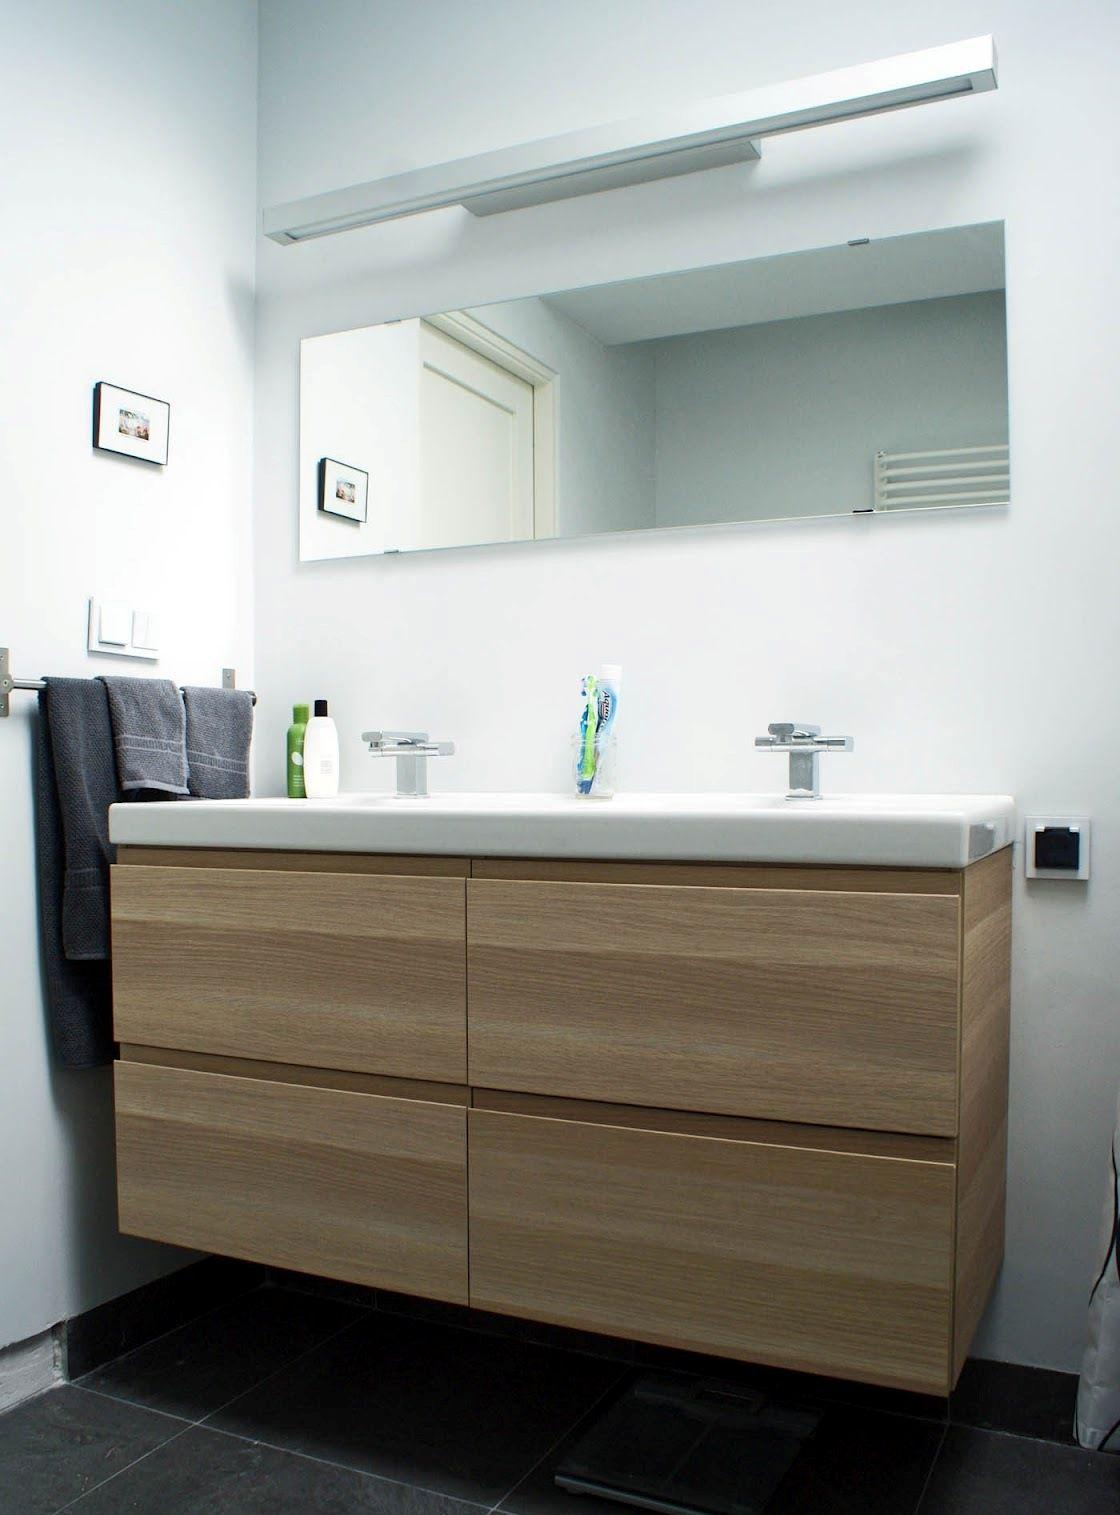 title mit bildern ikea badezimmer badezimmer on ikea bathroom vanities id=22362